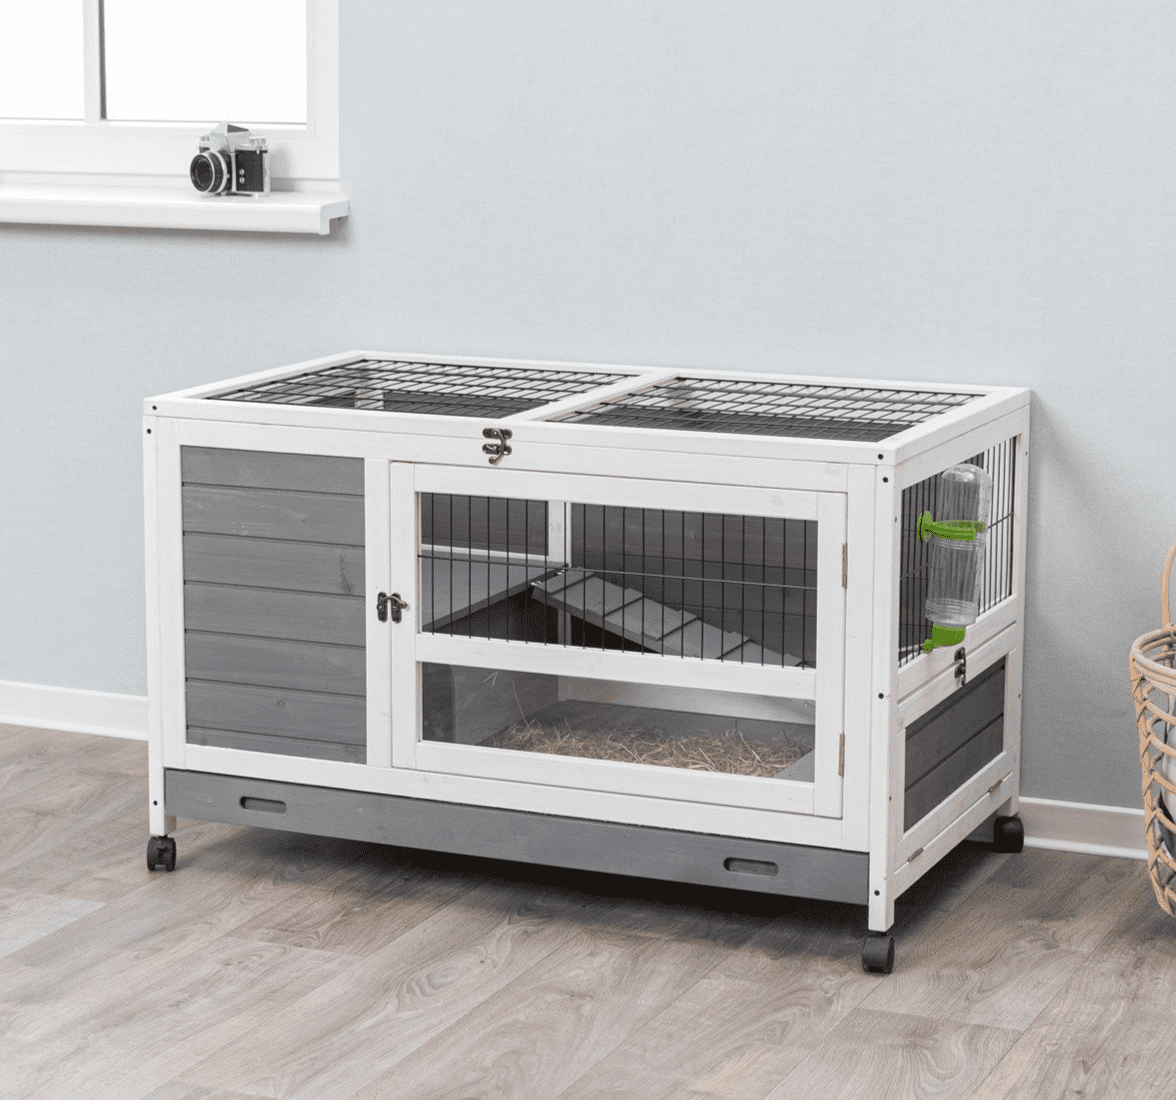 Trixie Pet Products Natura Indoor Rabbit Hutch